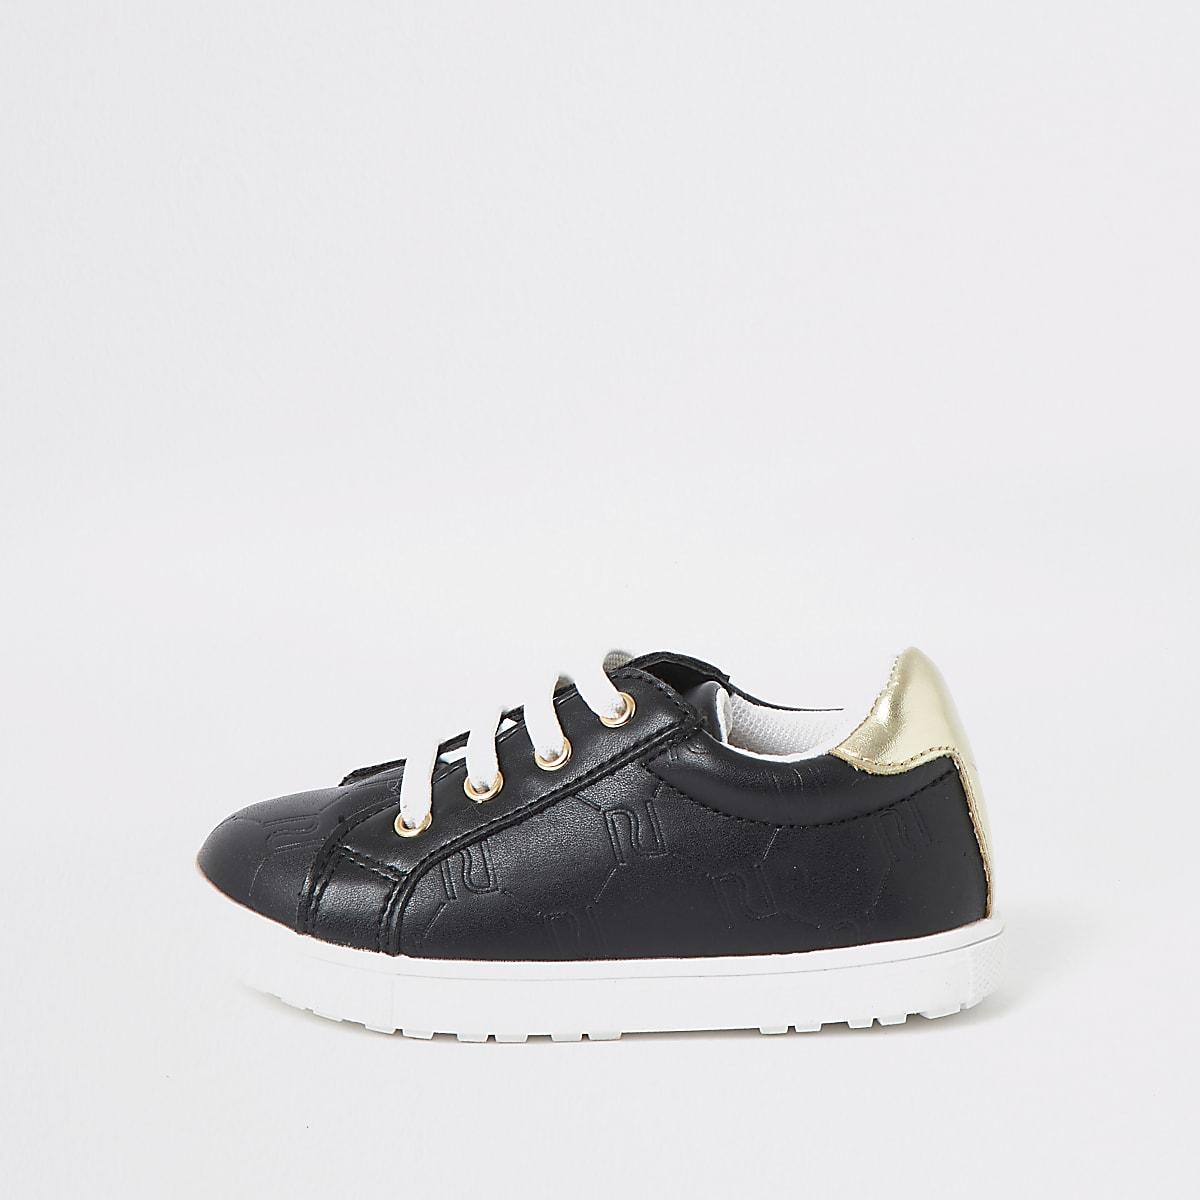 Mini - Zwarte sneakers met vetersluiting en RI-monogram voor meisjes